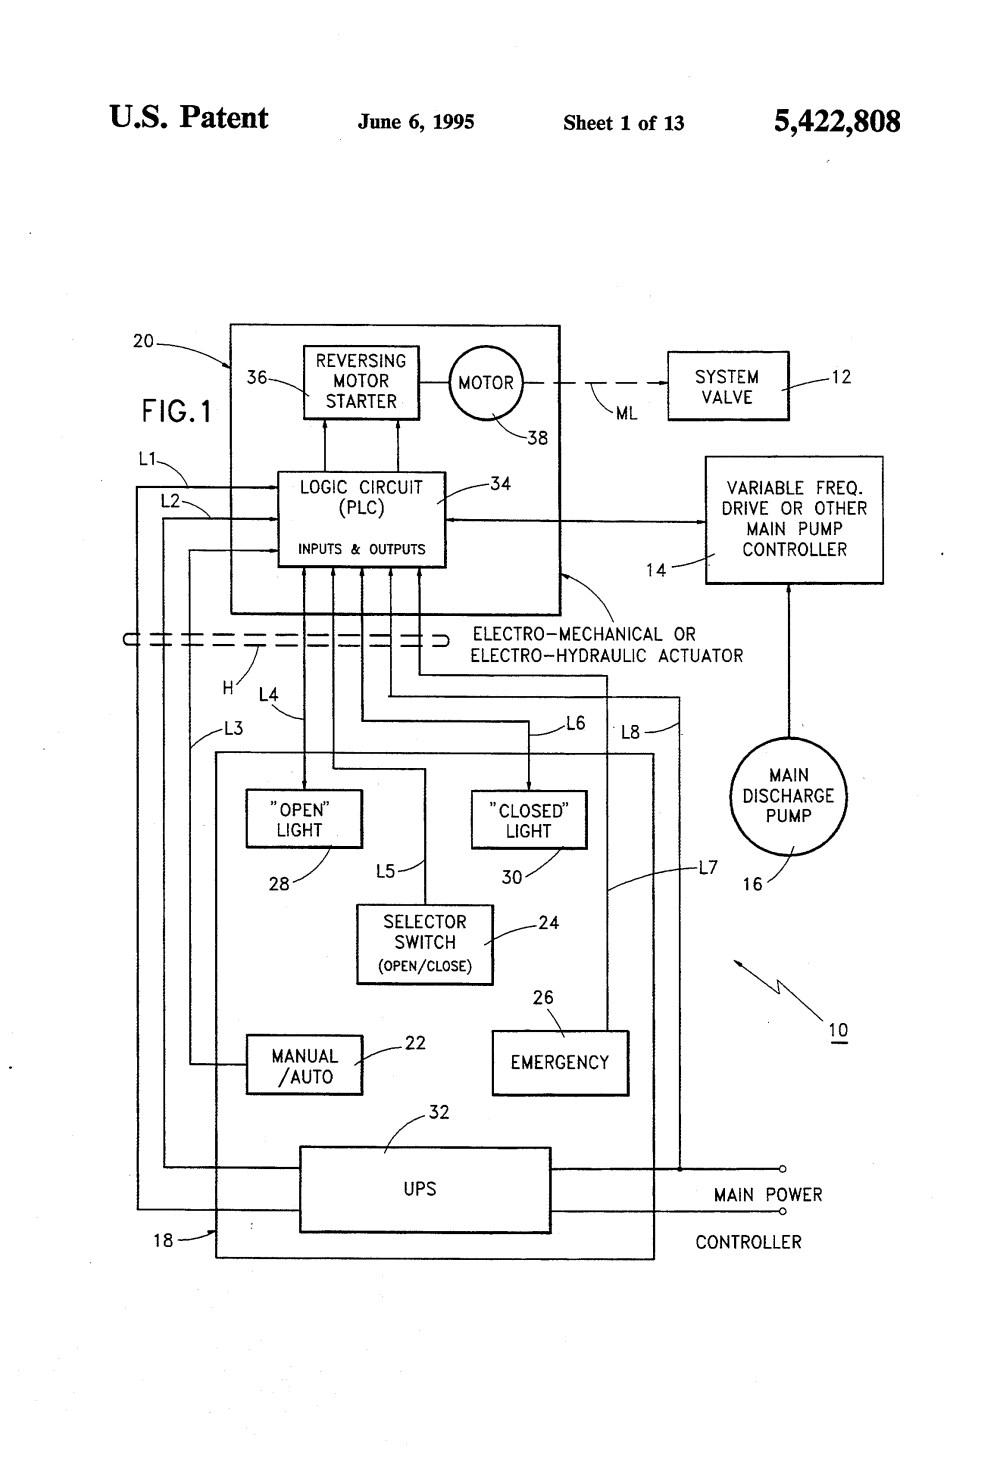 medium resolution of limitorque l120 wiring diagram free wiring diagramlimitorque l120 wiring diagram limitorque l120 wiring diagram fire smoke